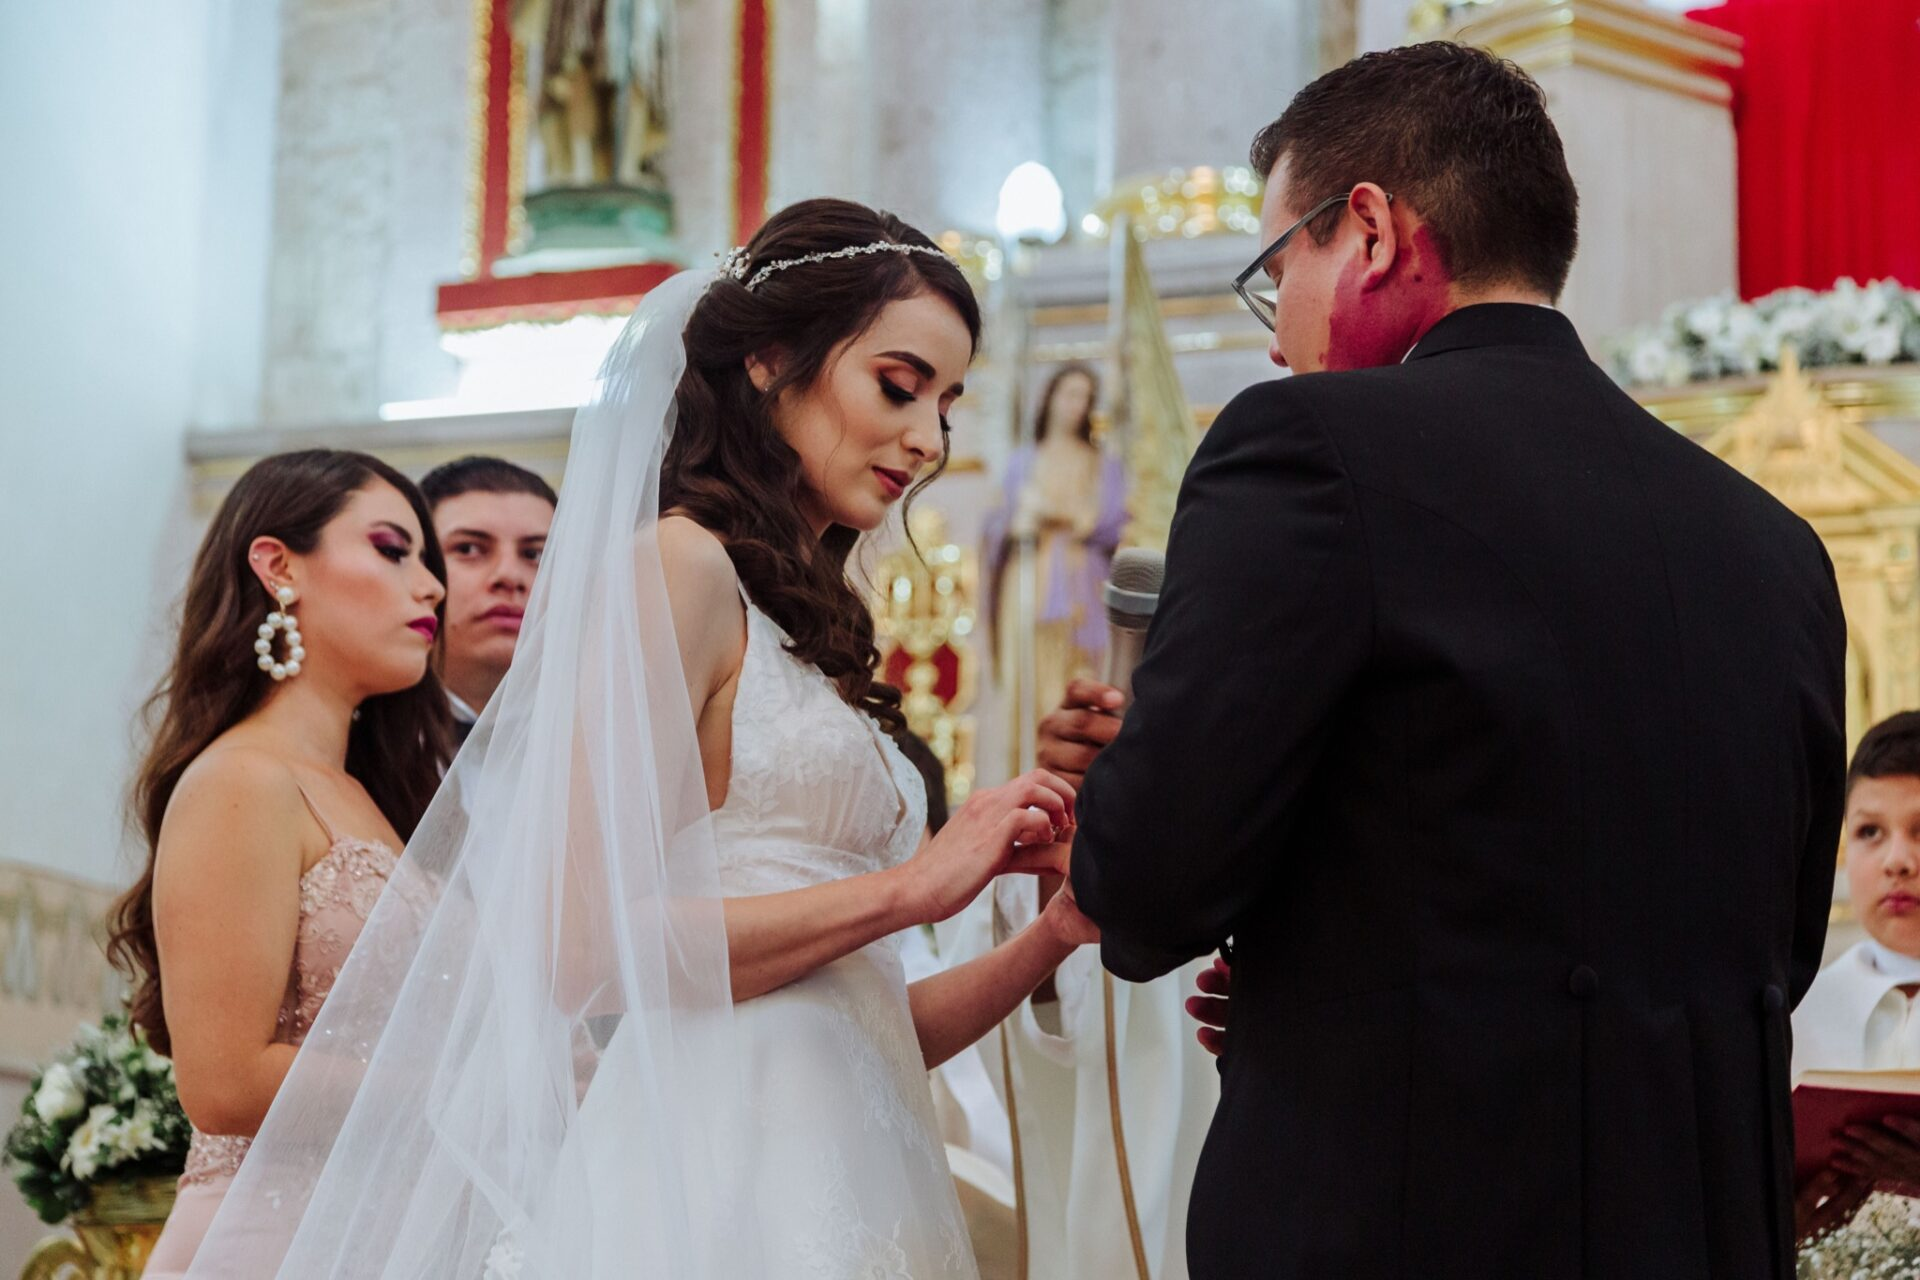 javier_noriega_fotografo_bodas_teul_zacatecas_wedding_photographer13a